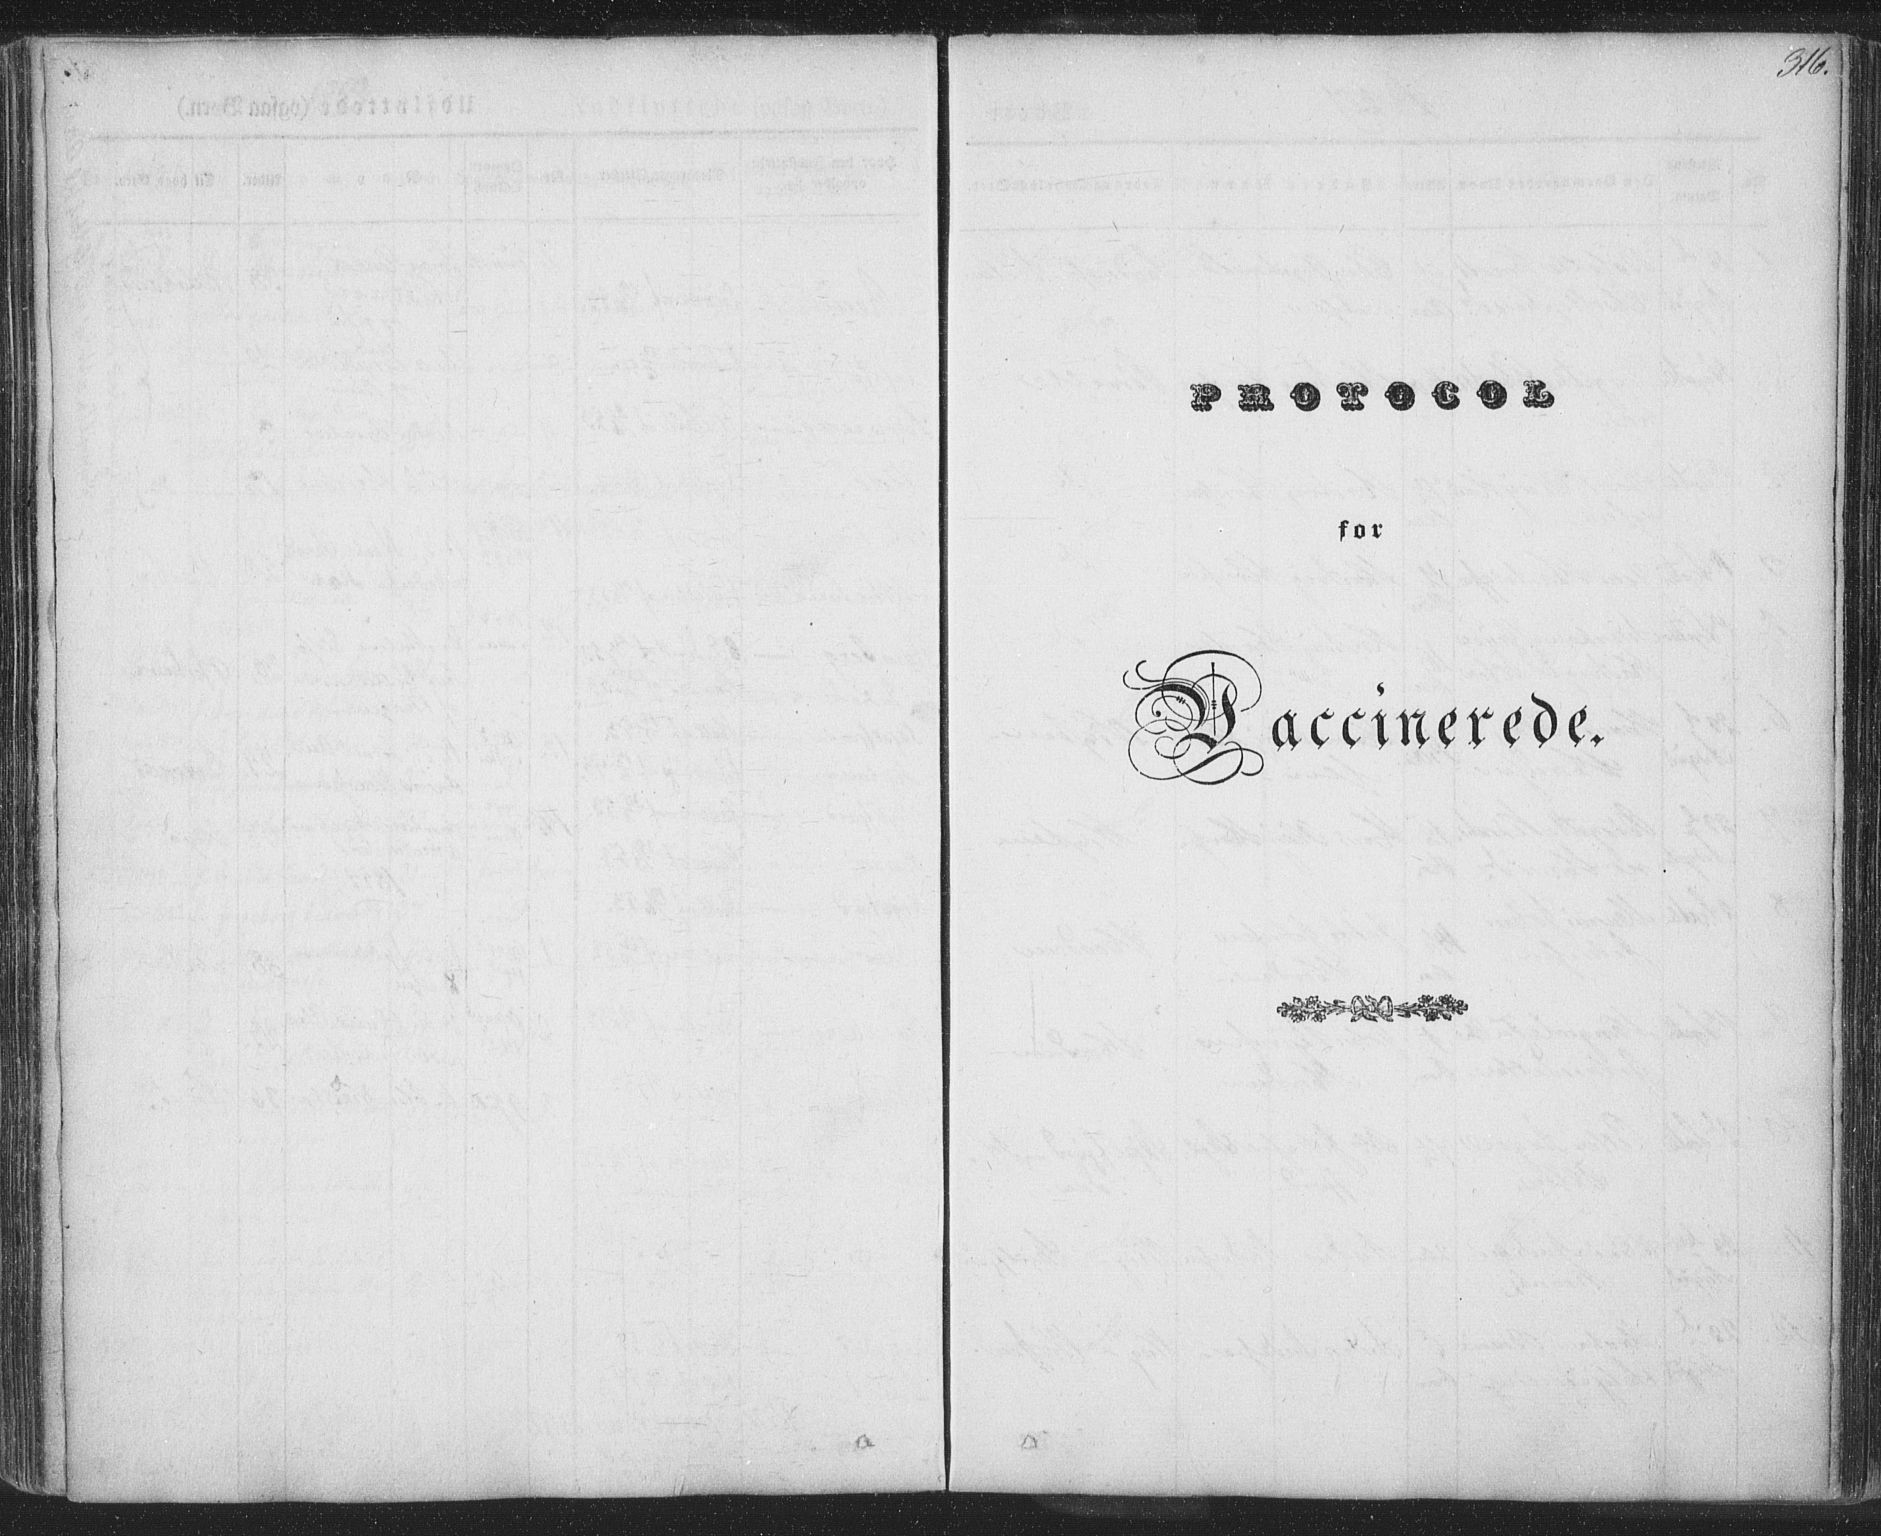 SAT, Ministerialprotokoller, klokkerbøker og fødselsregistre - Nordland, 885/L1202: Ministerialbok nr. 885A03, 1838-1859, s. 316